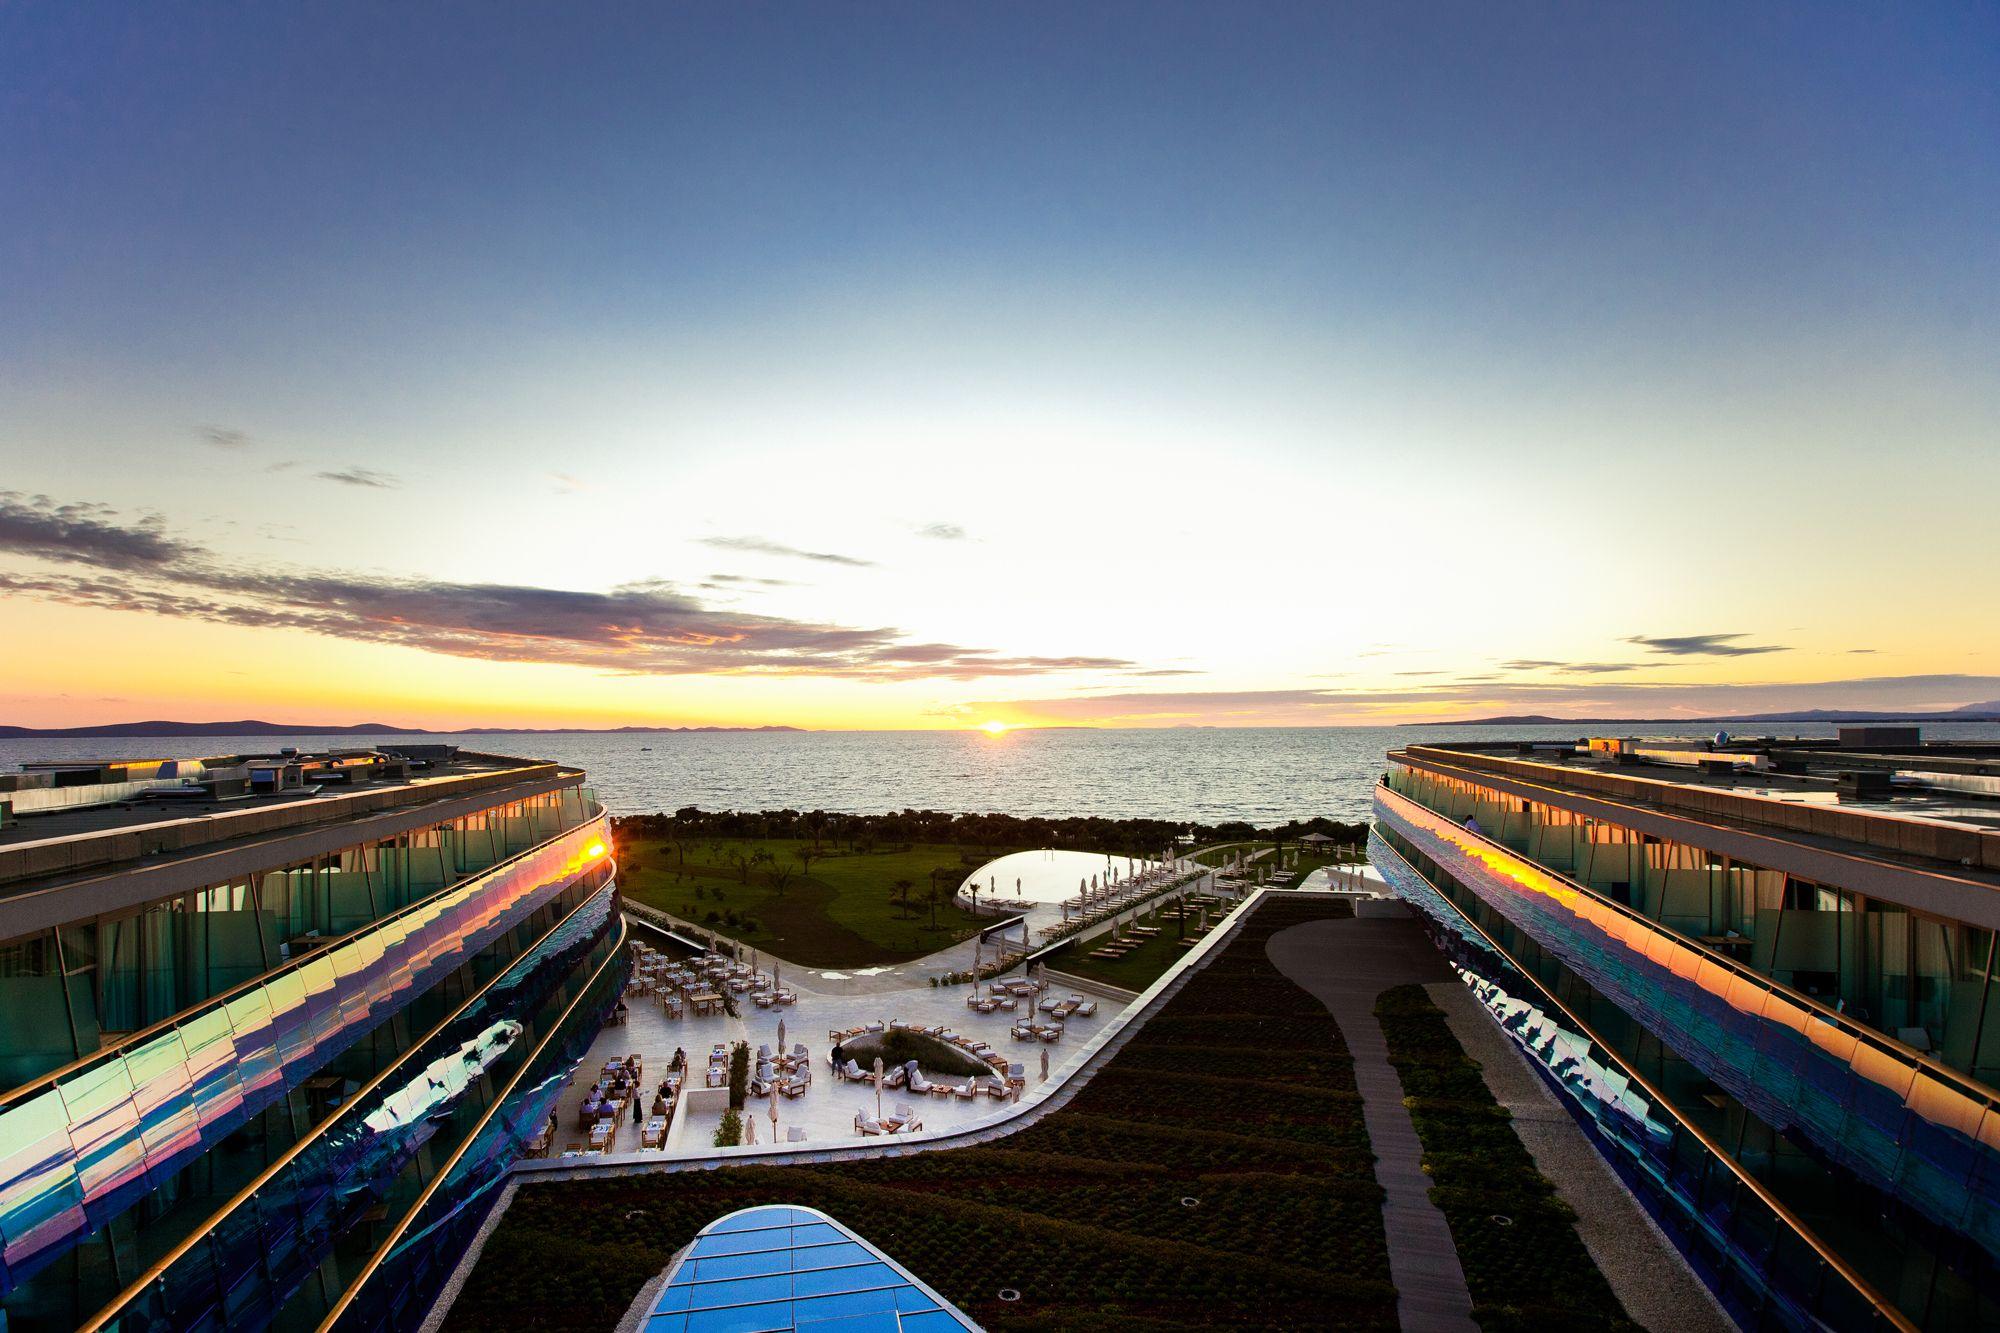 Falkensteiner Michaeler Tourism Group AG - Kroatiens Tourismus-Vorzeigeprojekt Punta Skala wurde am 4. Mai 2012 offiziell eröffnet.